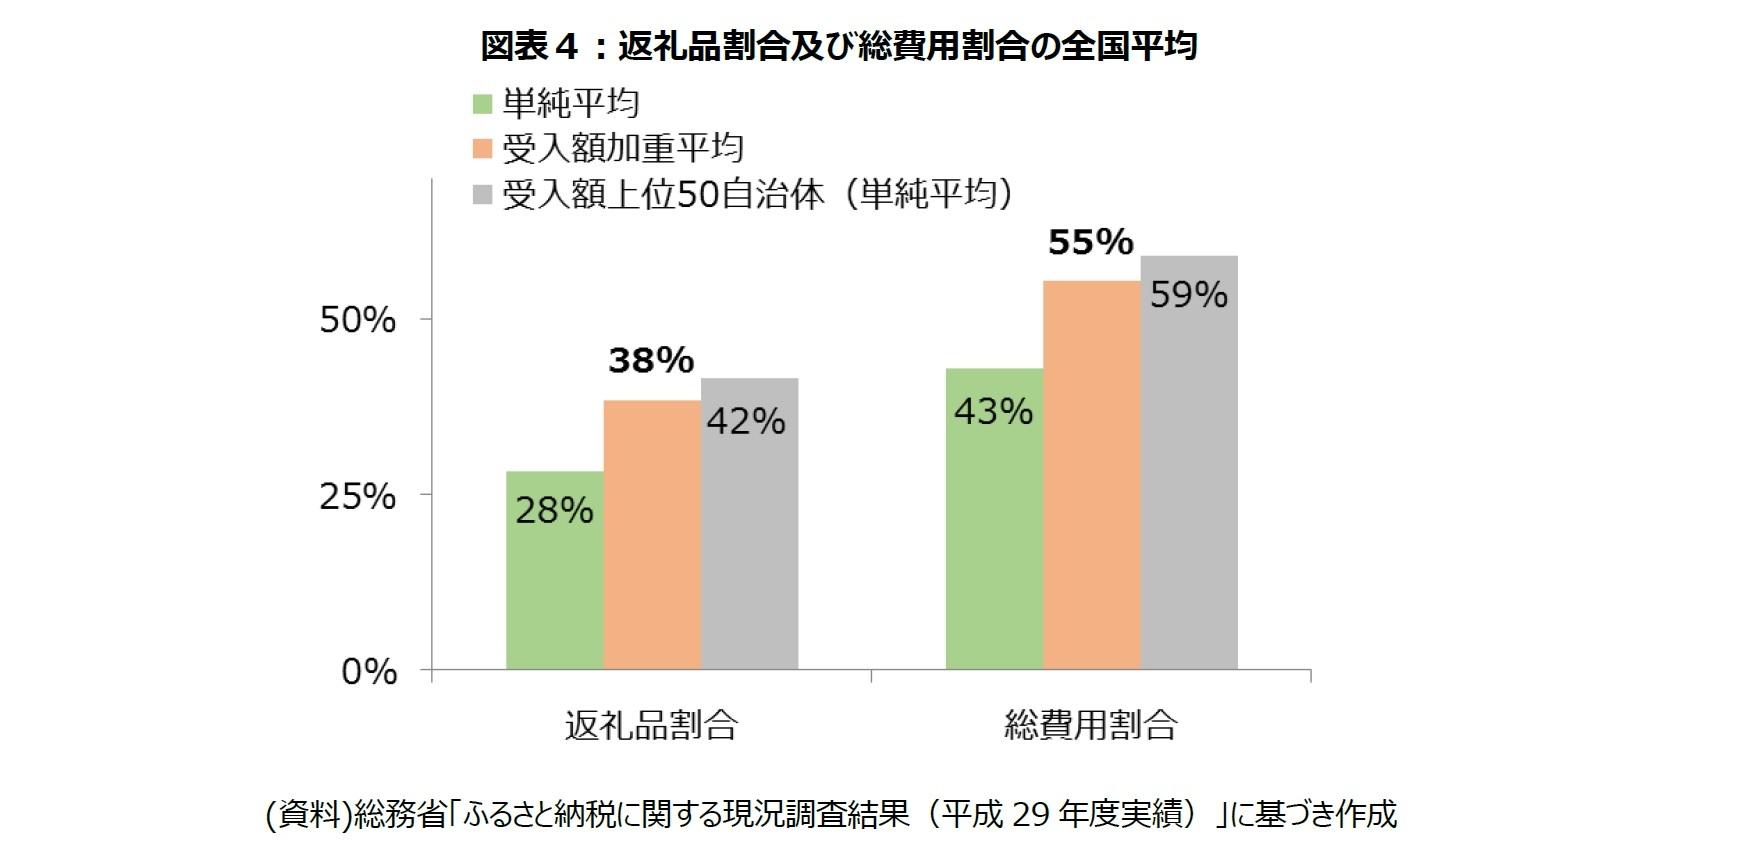 図表4:返礼品割合及び総費用割合の全国平均